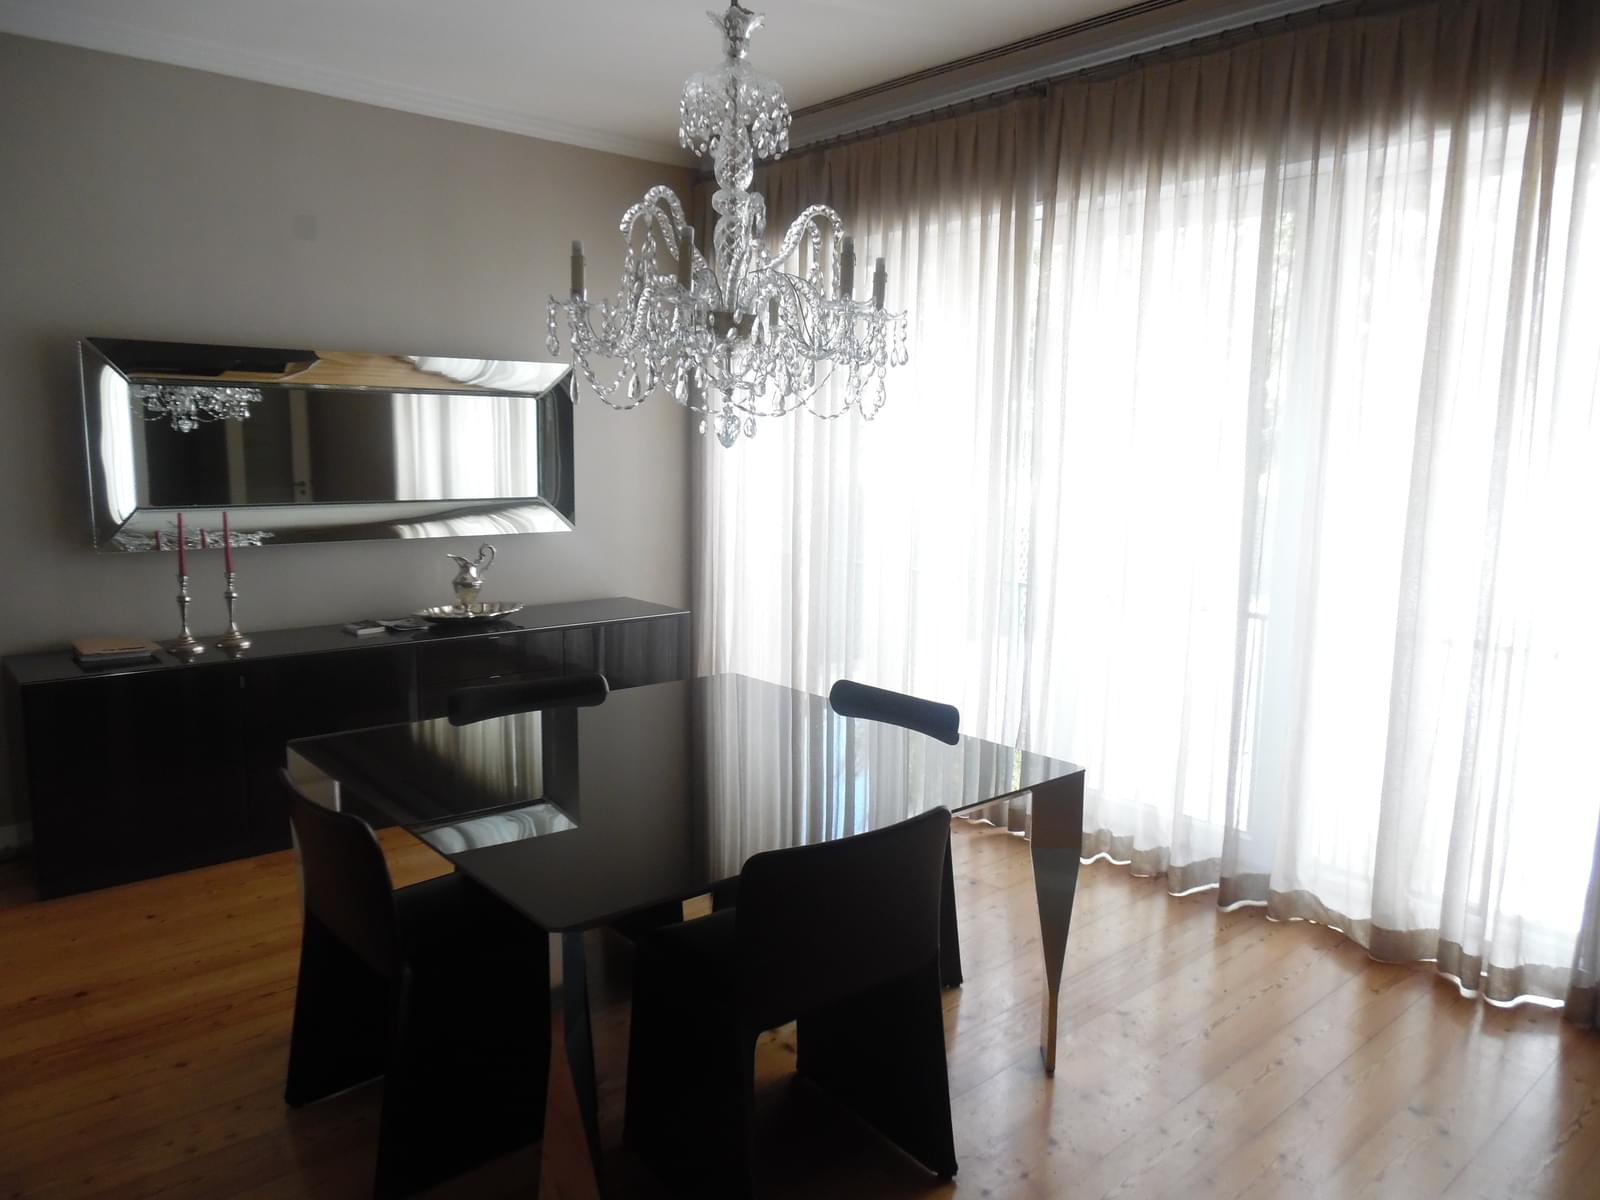 pf17454-apartamento-t4-lisboa-9ff627d7-b604-455e-aee8-0d5d0657e2af